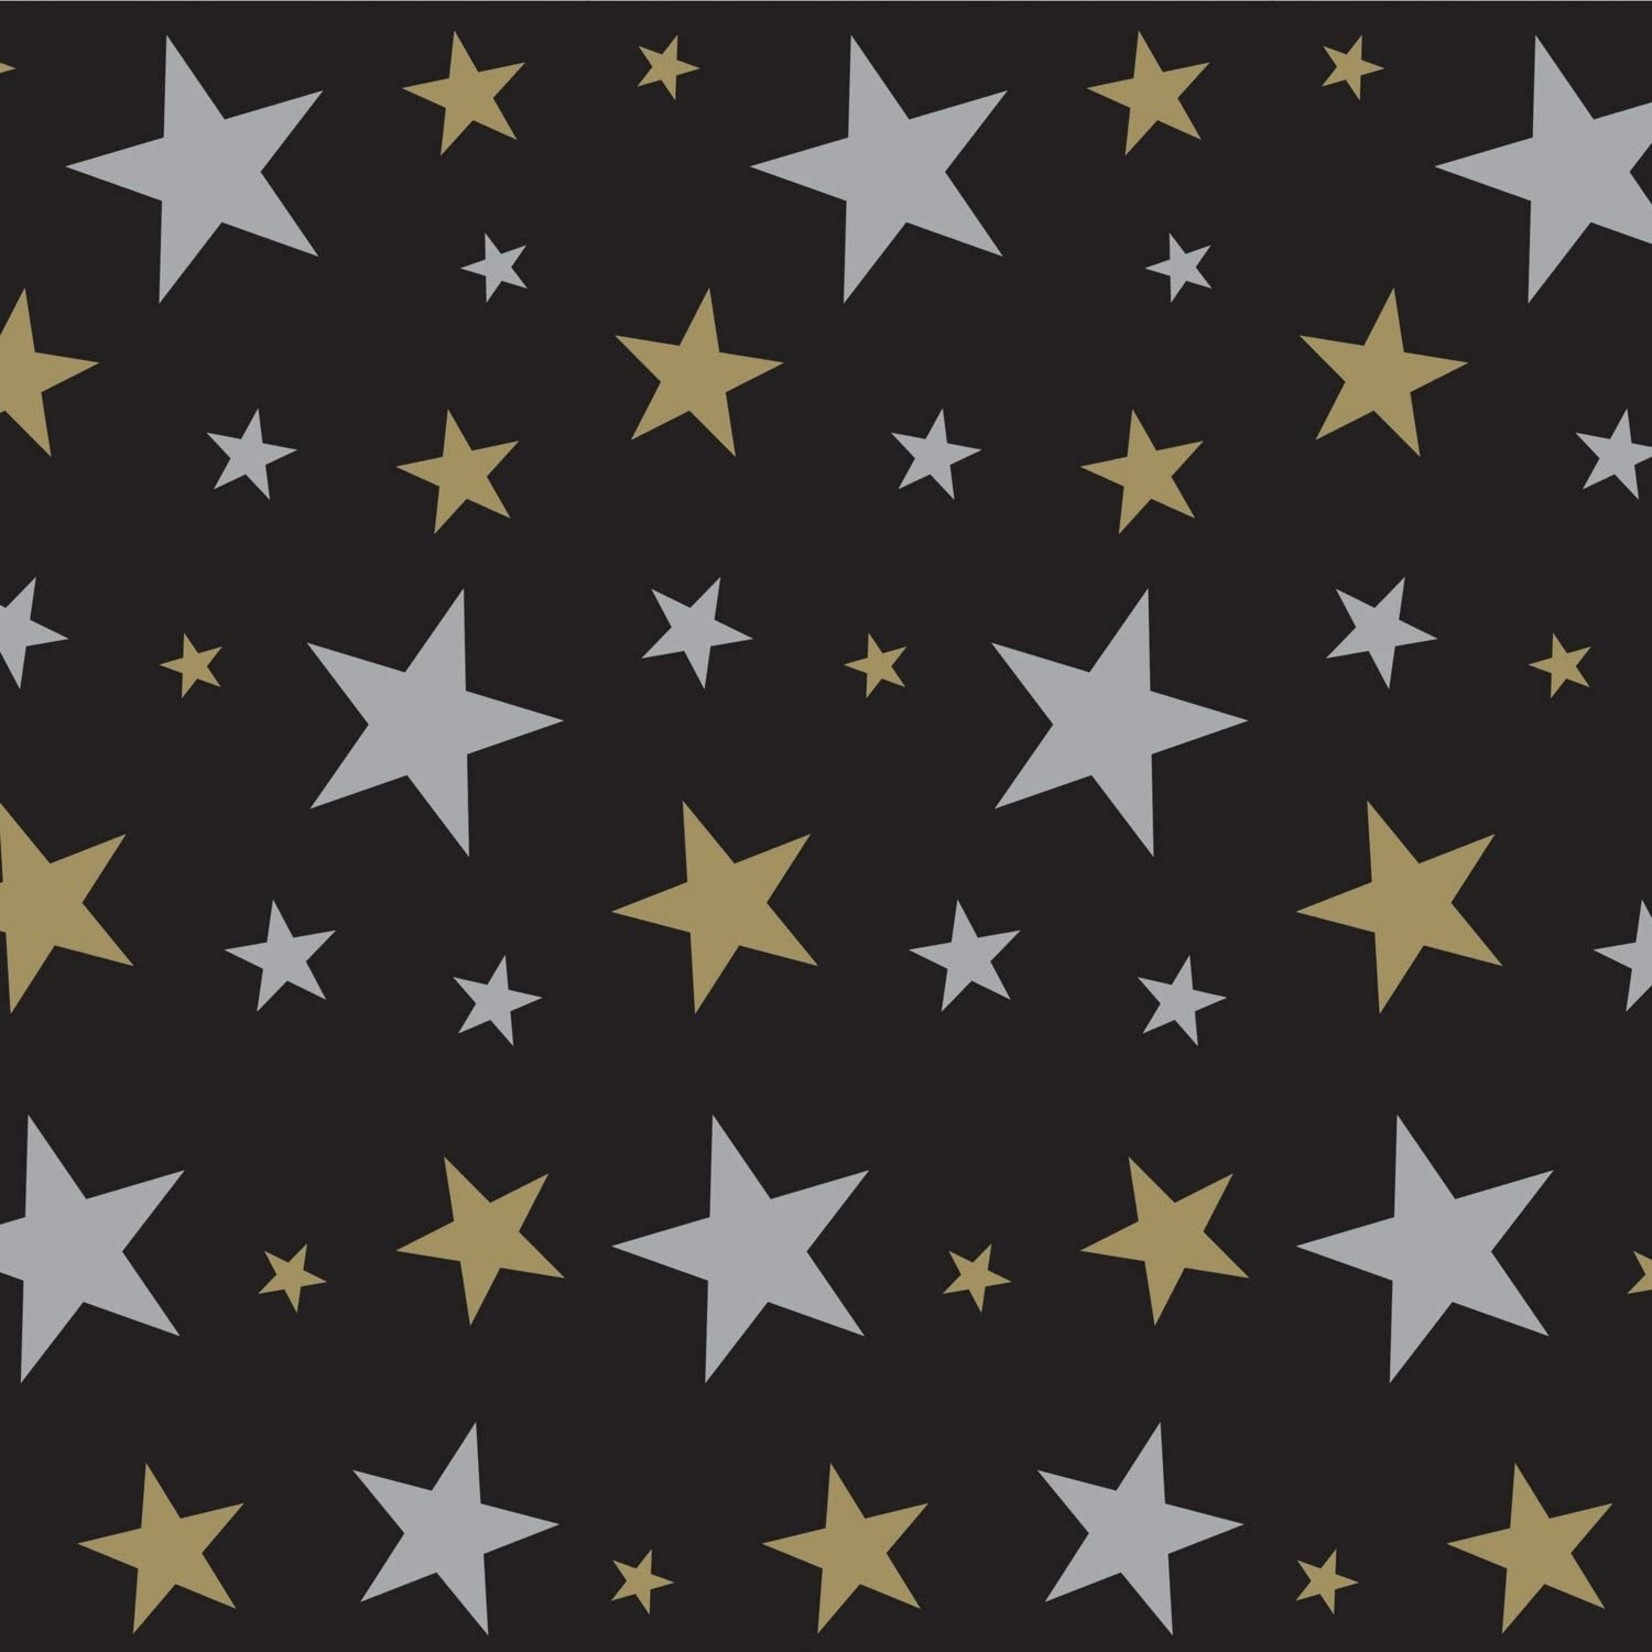 Backdrop - Star - 30ft